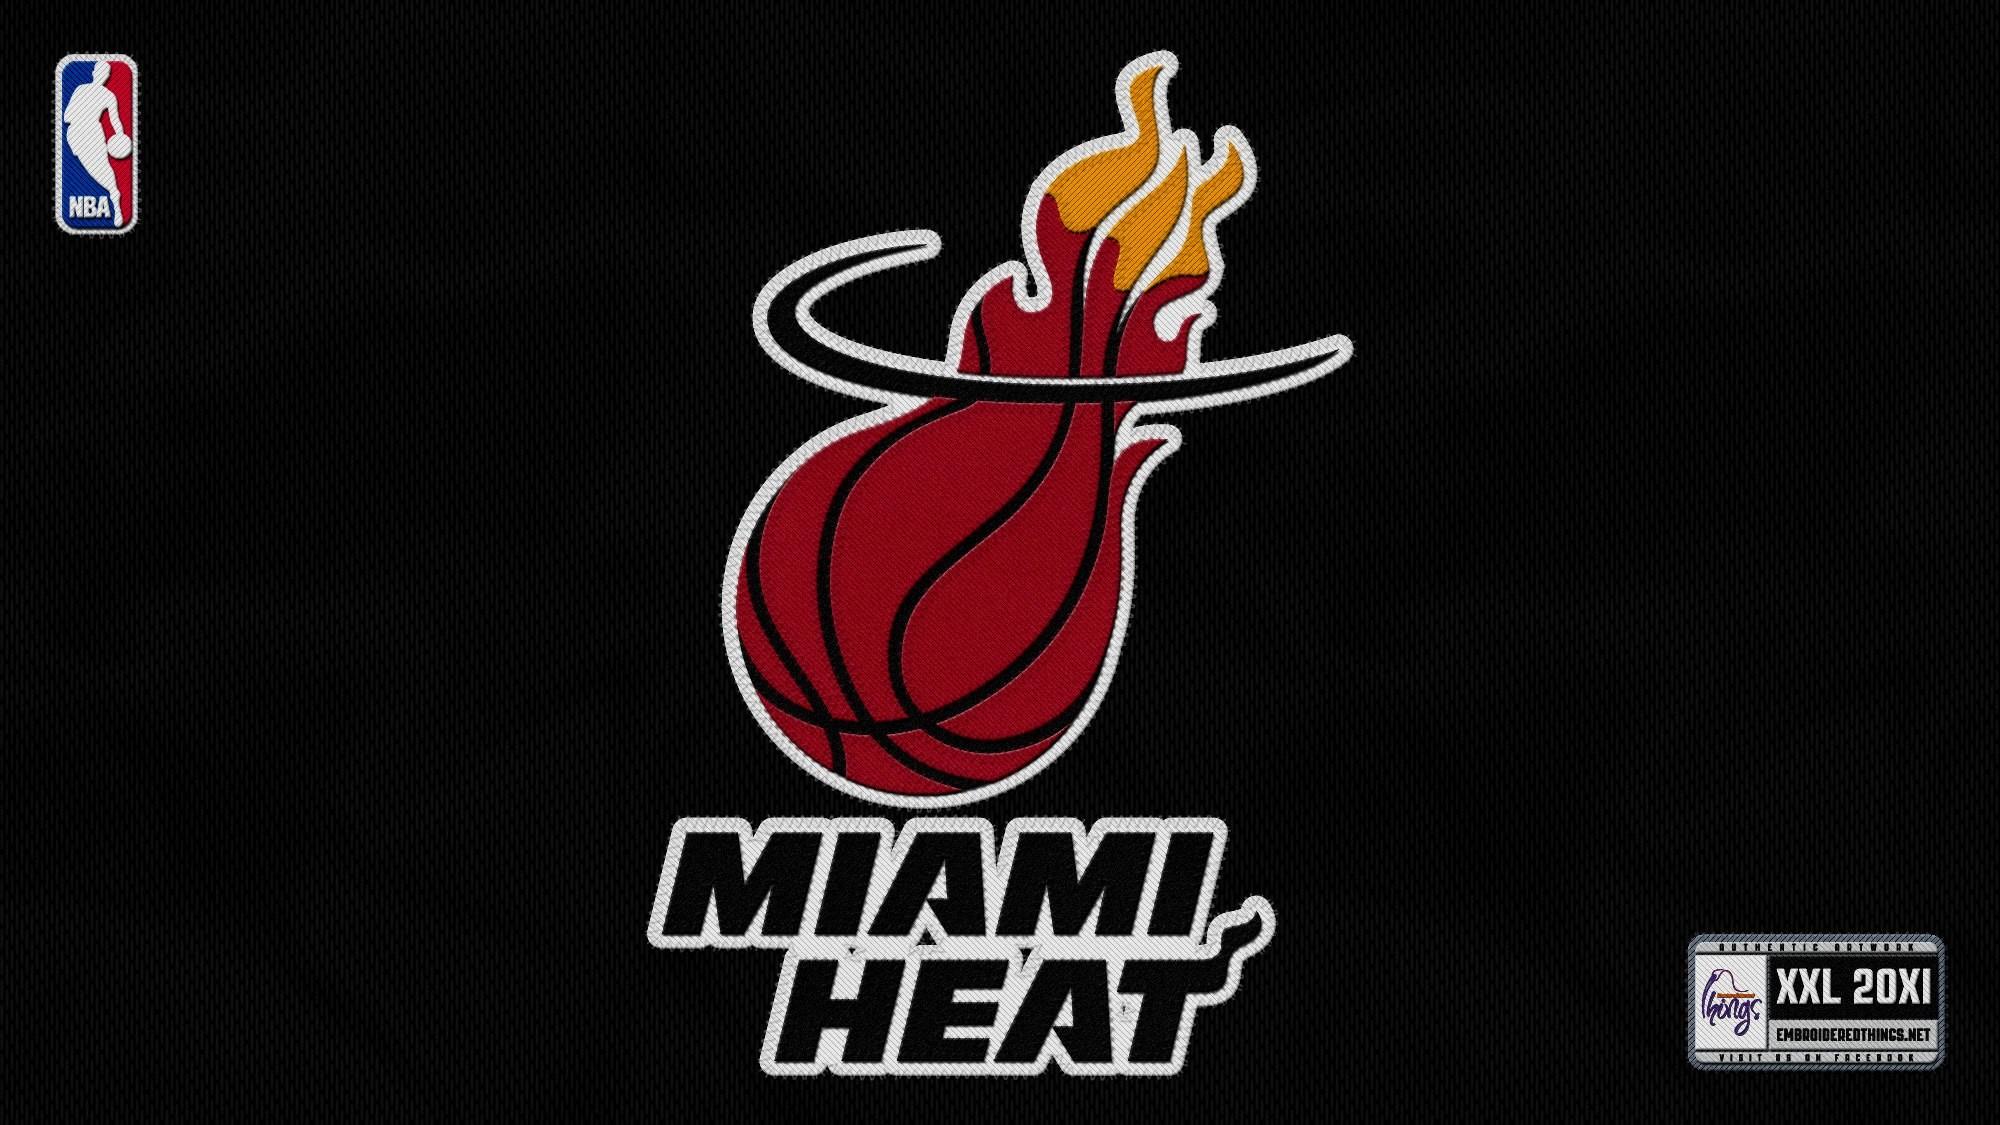 Miami Heat NBA Logo   wallpapers55.com – Best Wallpapers for PCs .